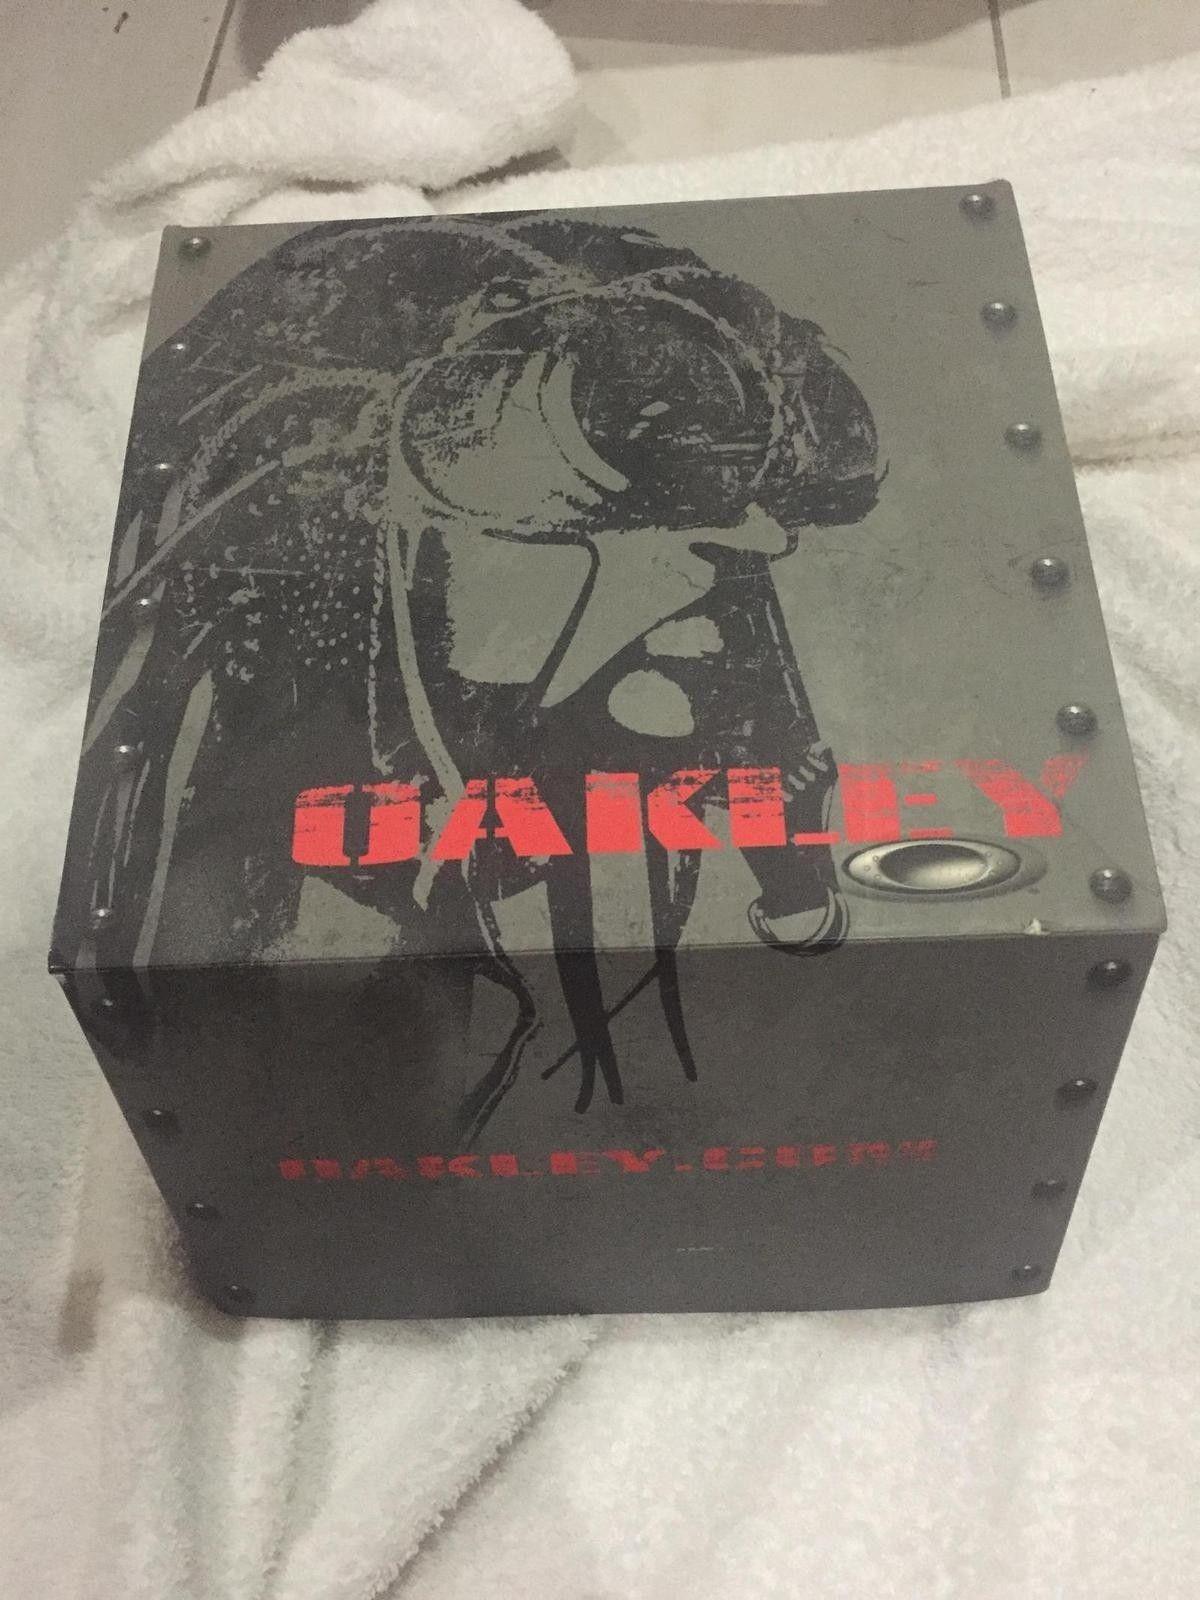 Oakley Medusa S/M NiB with tags Sold - 8HcScAg.jpg